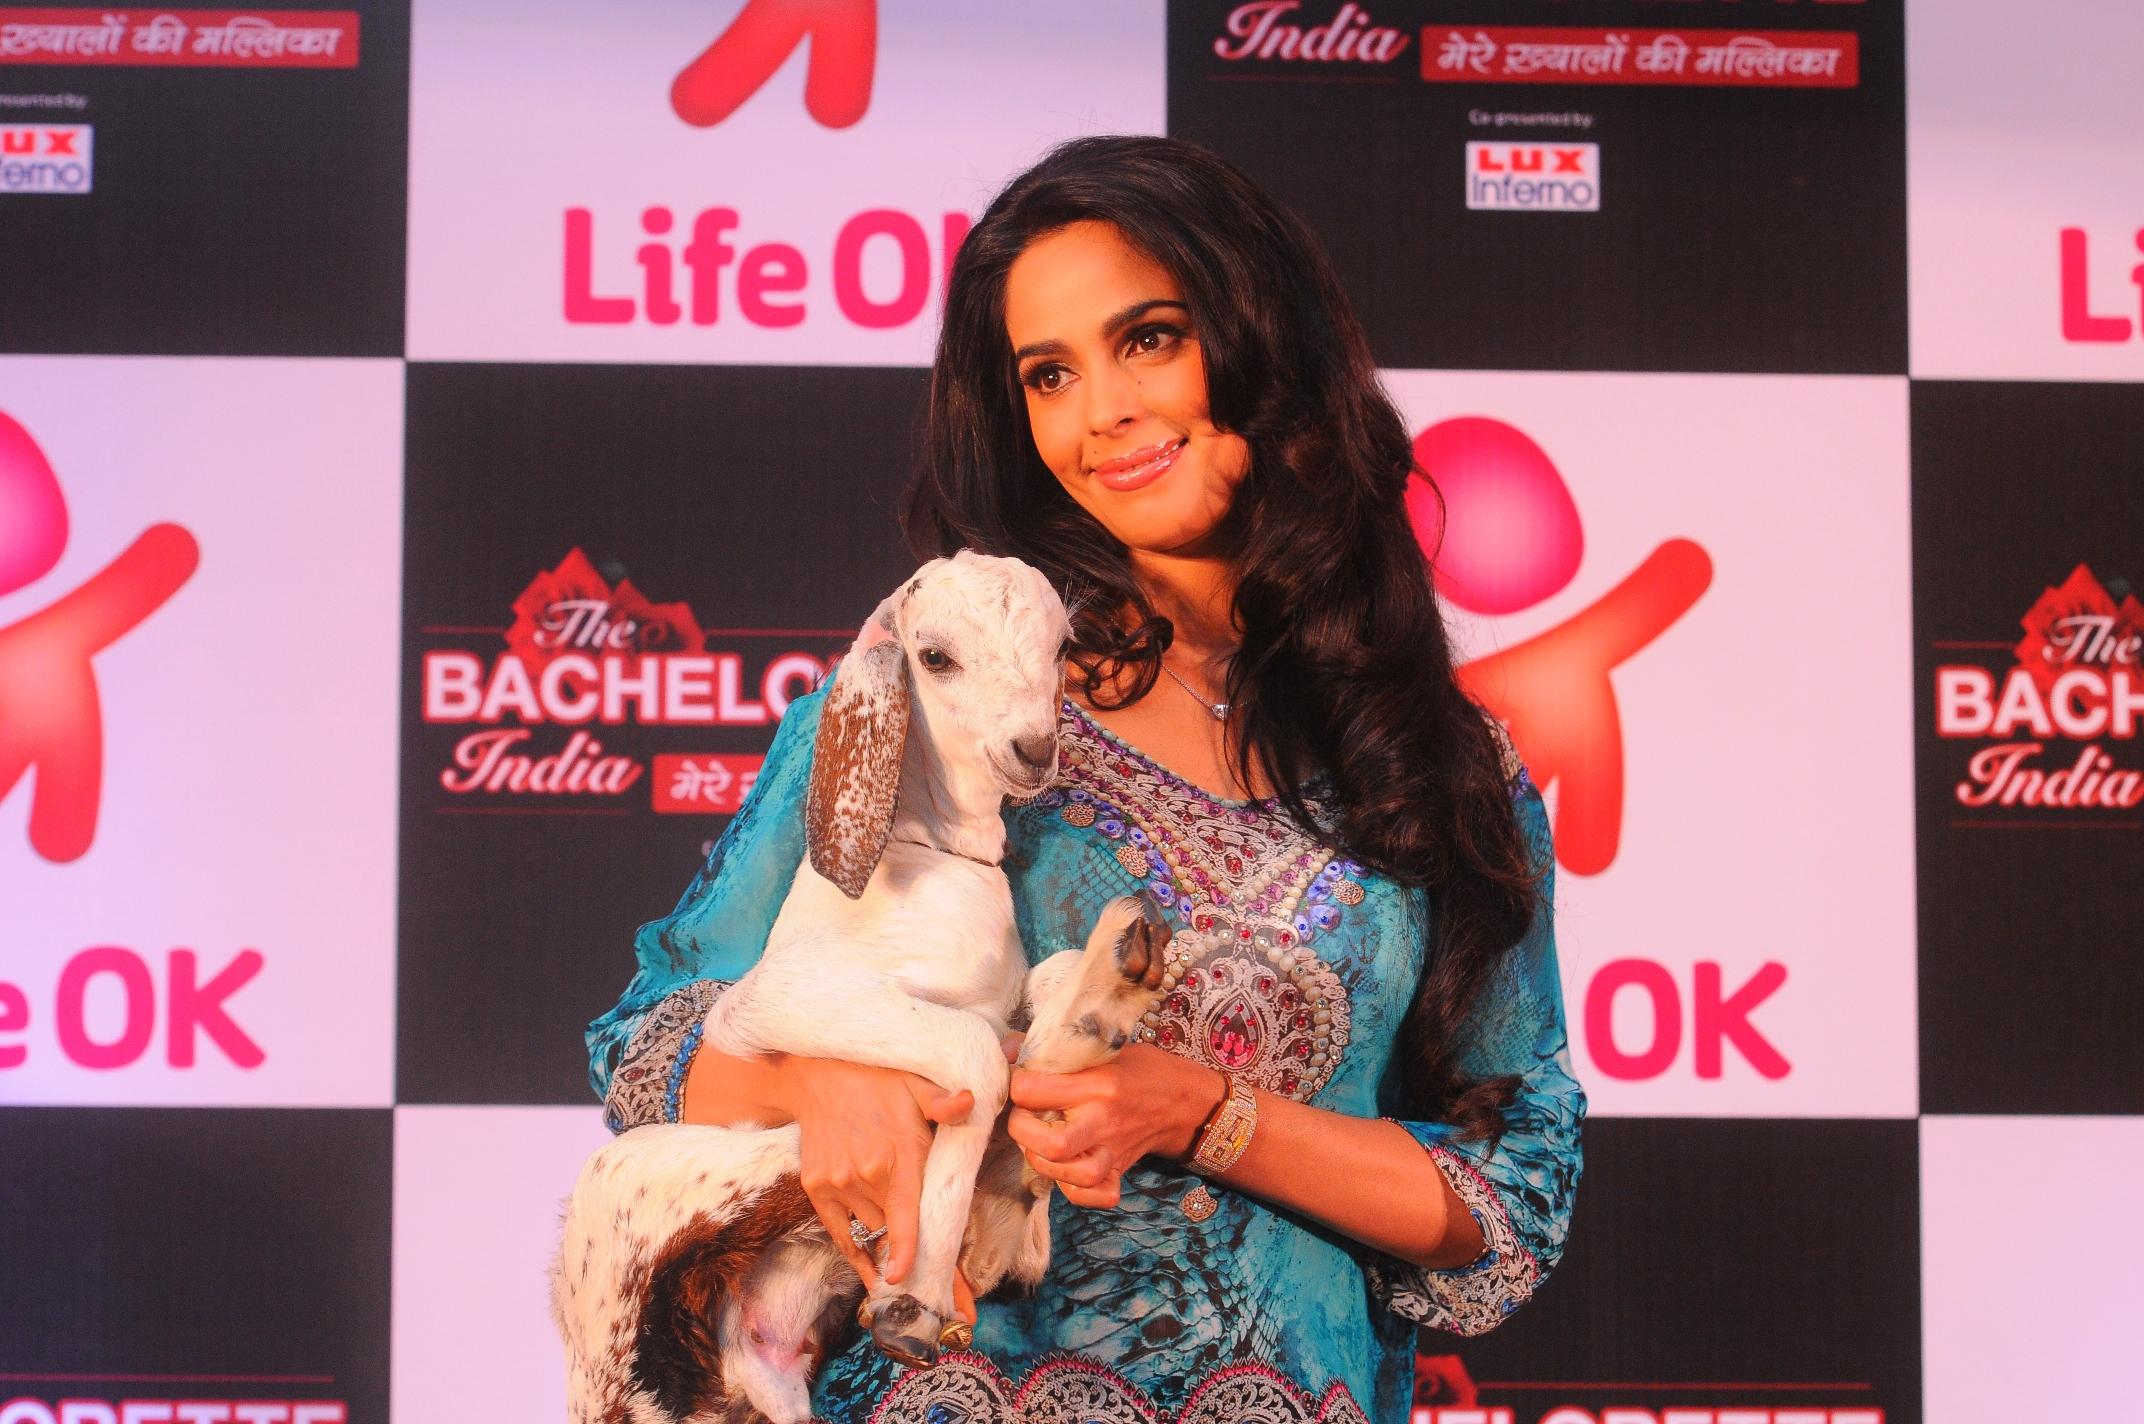 The Bachelorette Tv Show Of India